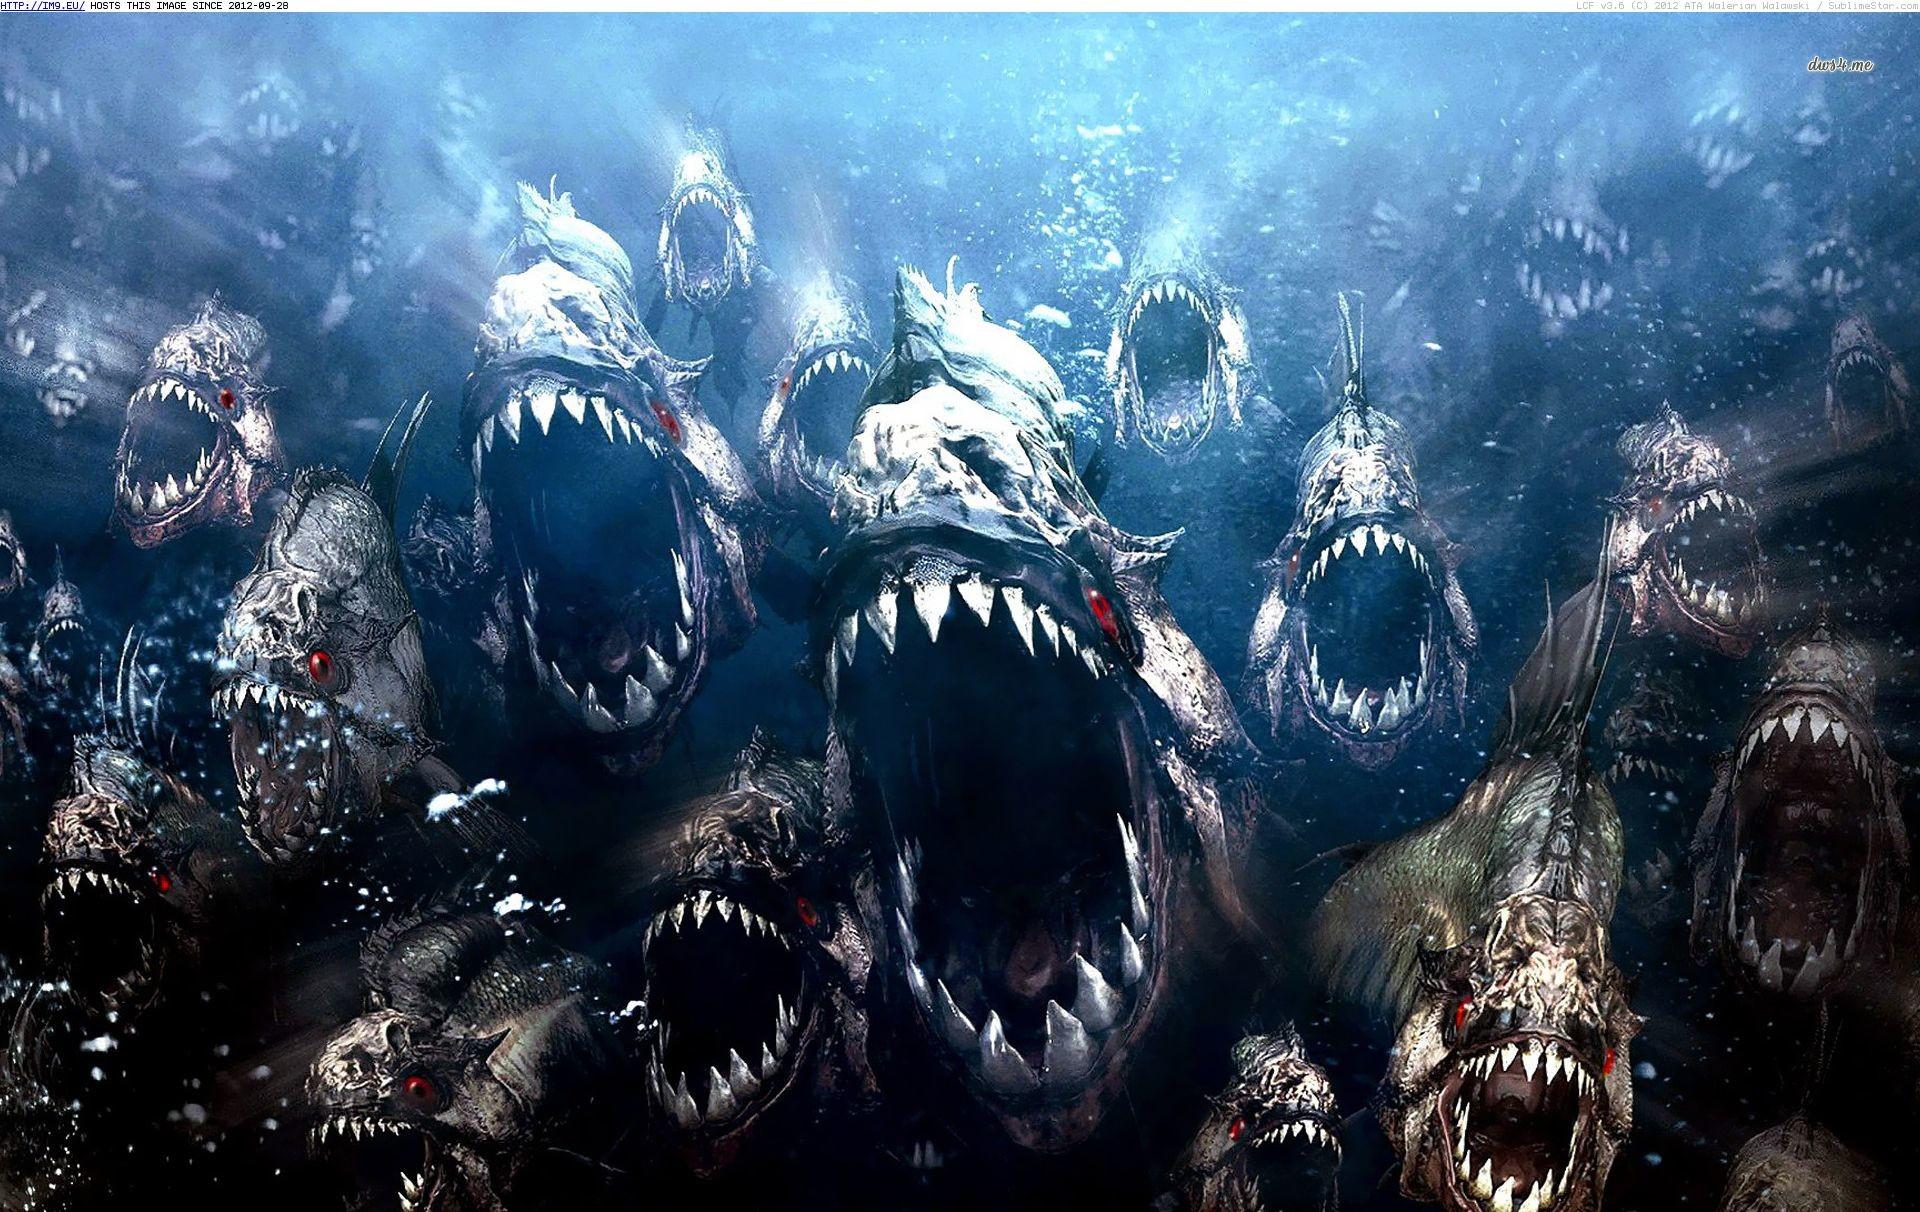 Piranha Movie Wallpaper